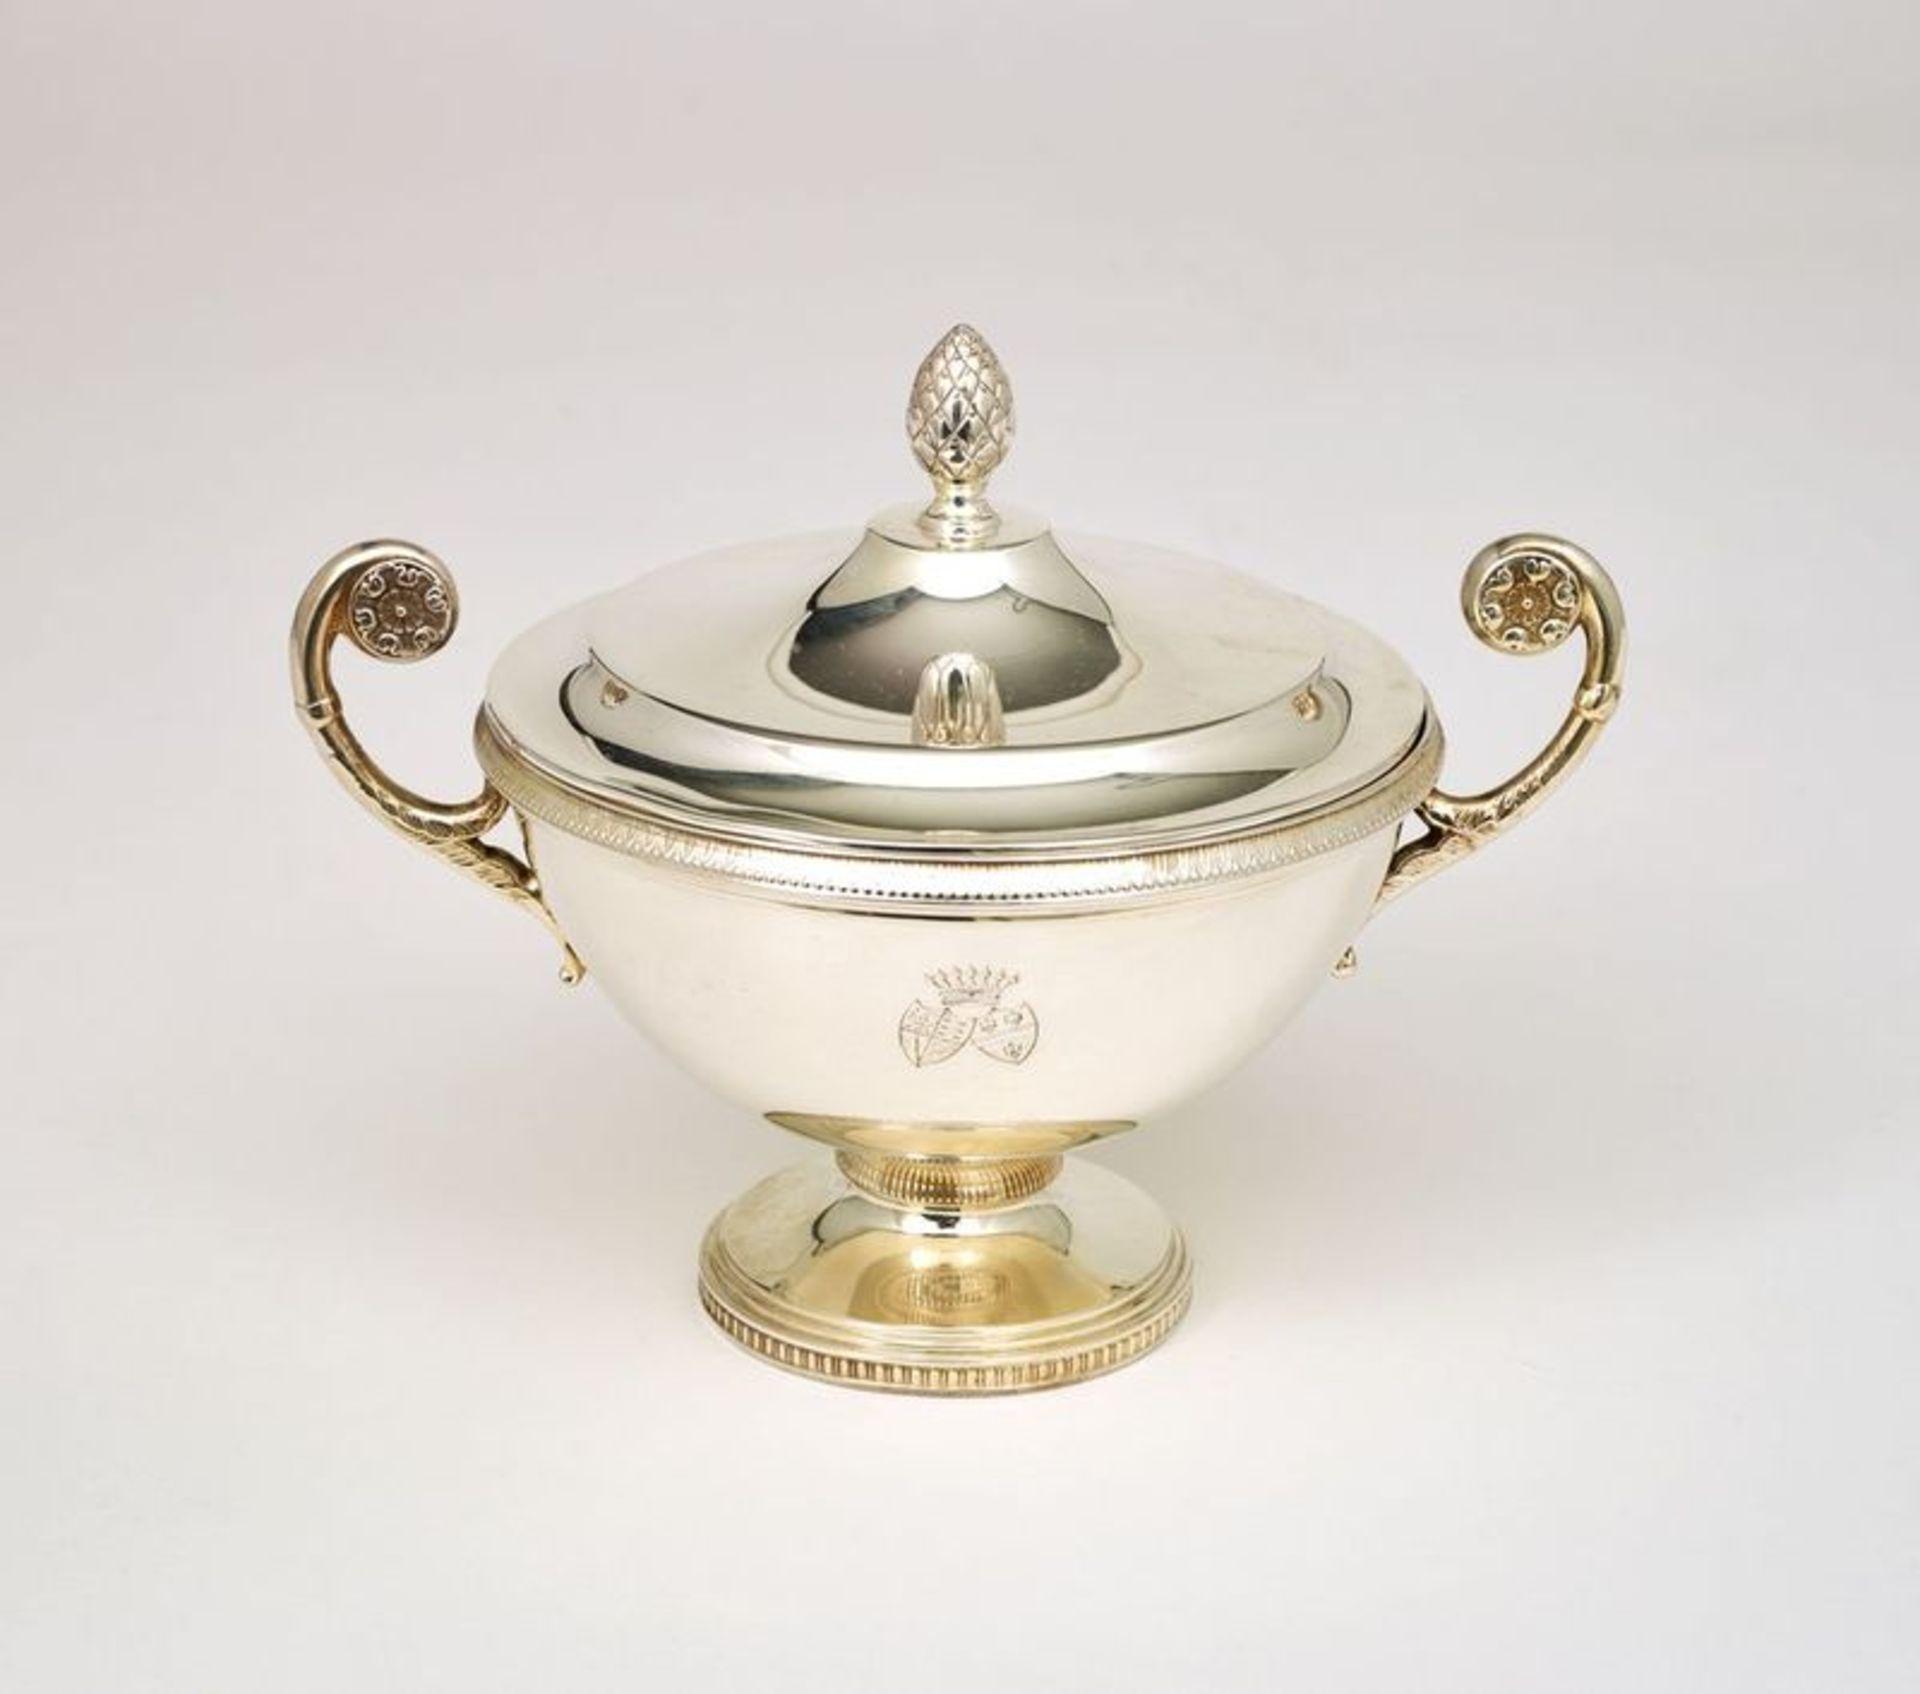 SILVER TEA AND COFFEE SERVICE SET FROM VIENNA BY ALEXANDER STURM - Silver set, 7 [...] - Bild 5 aus 5